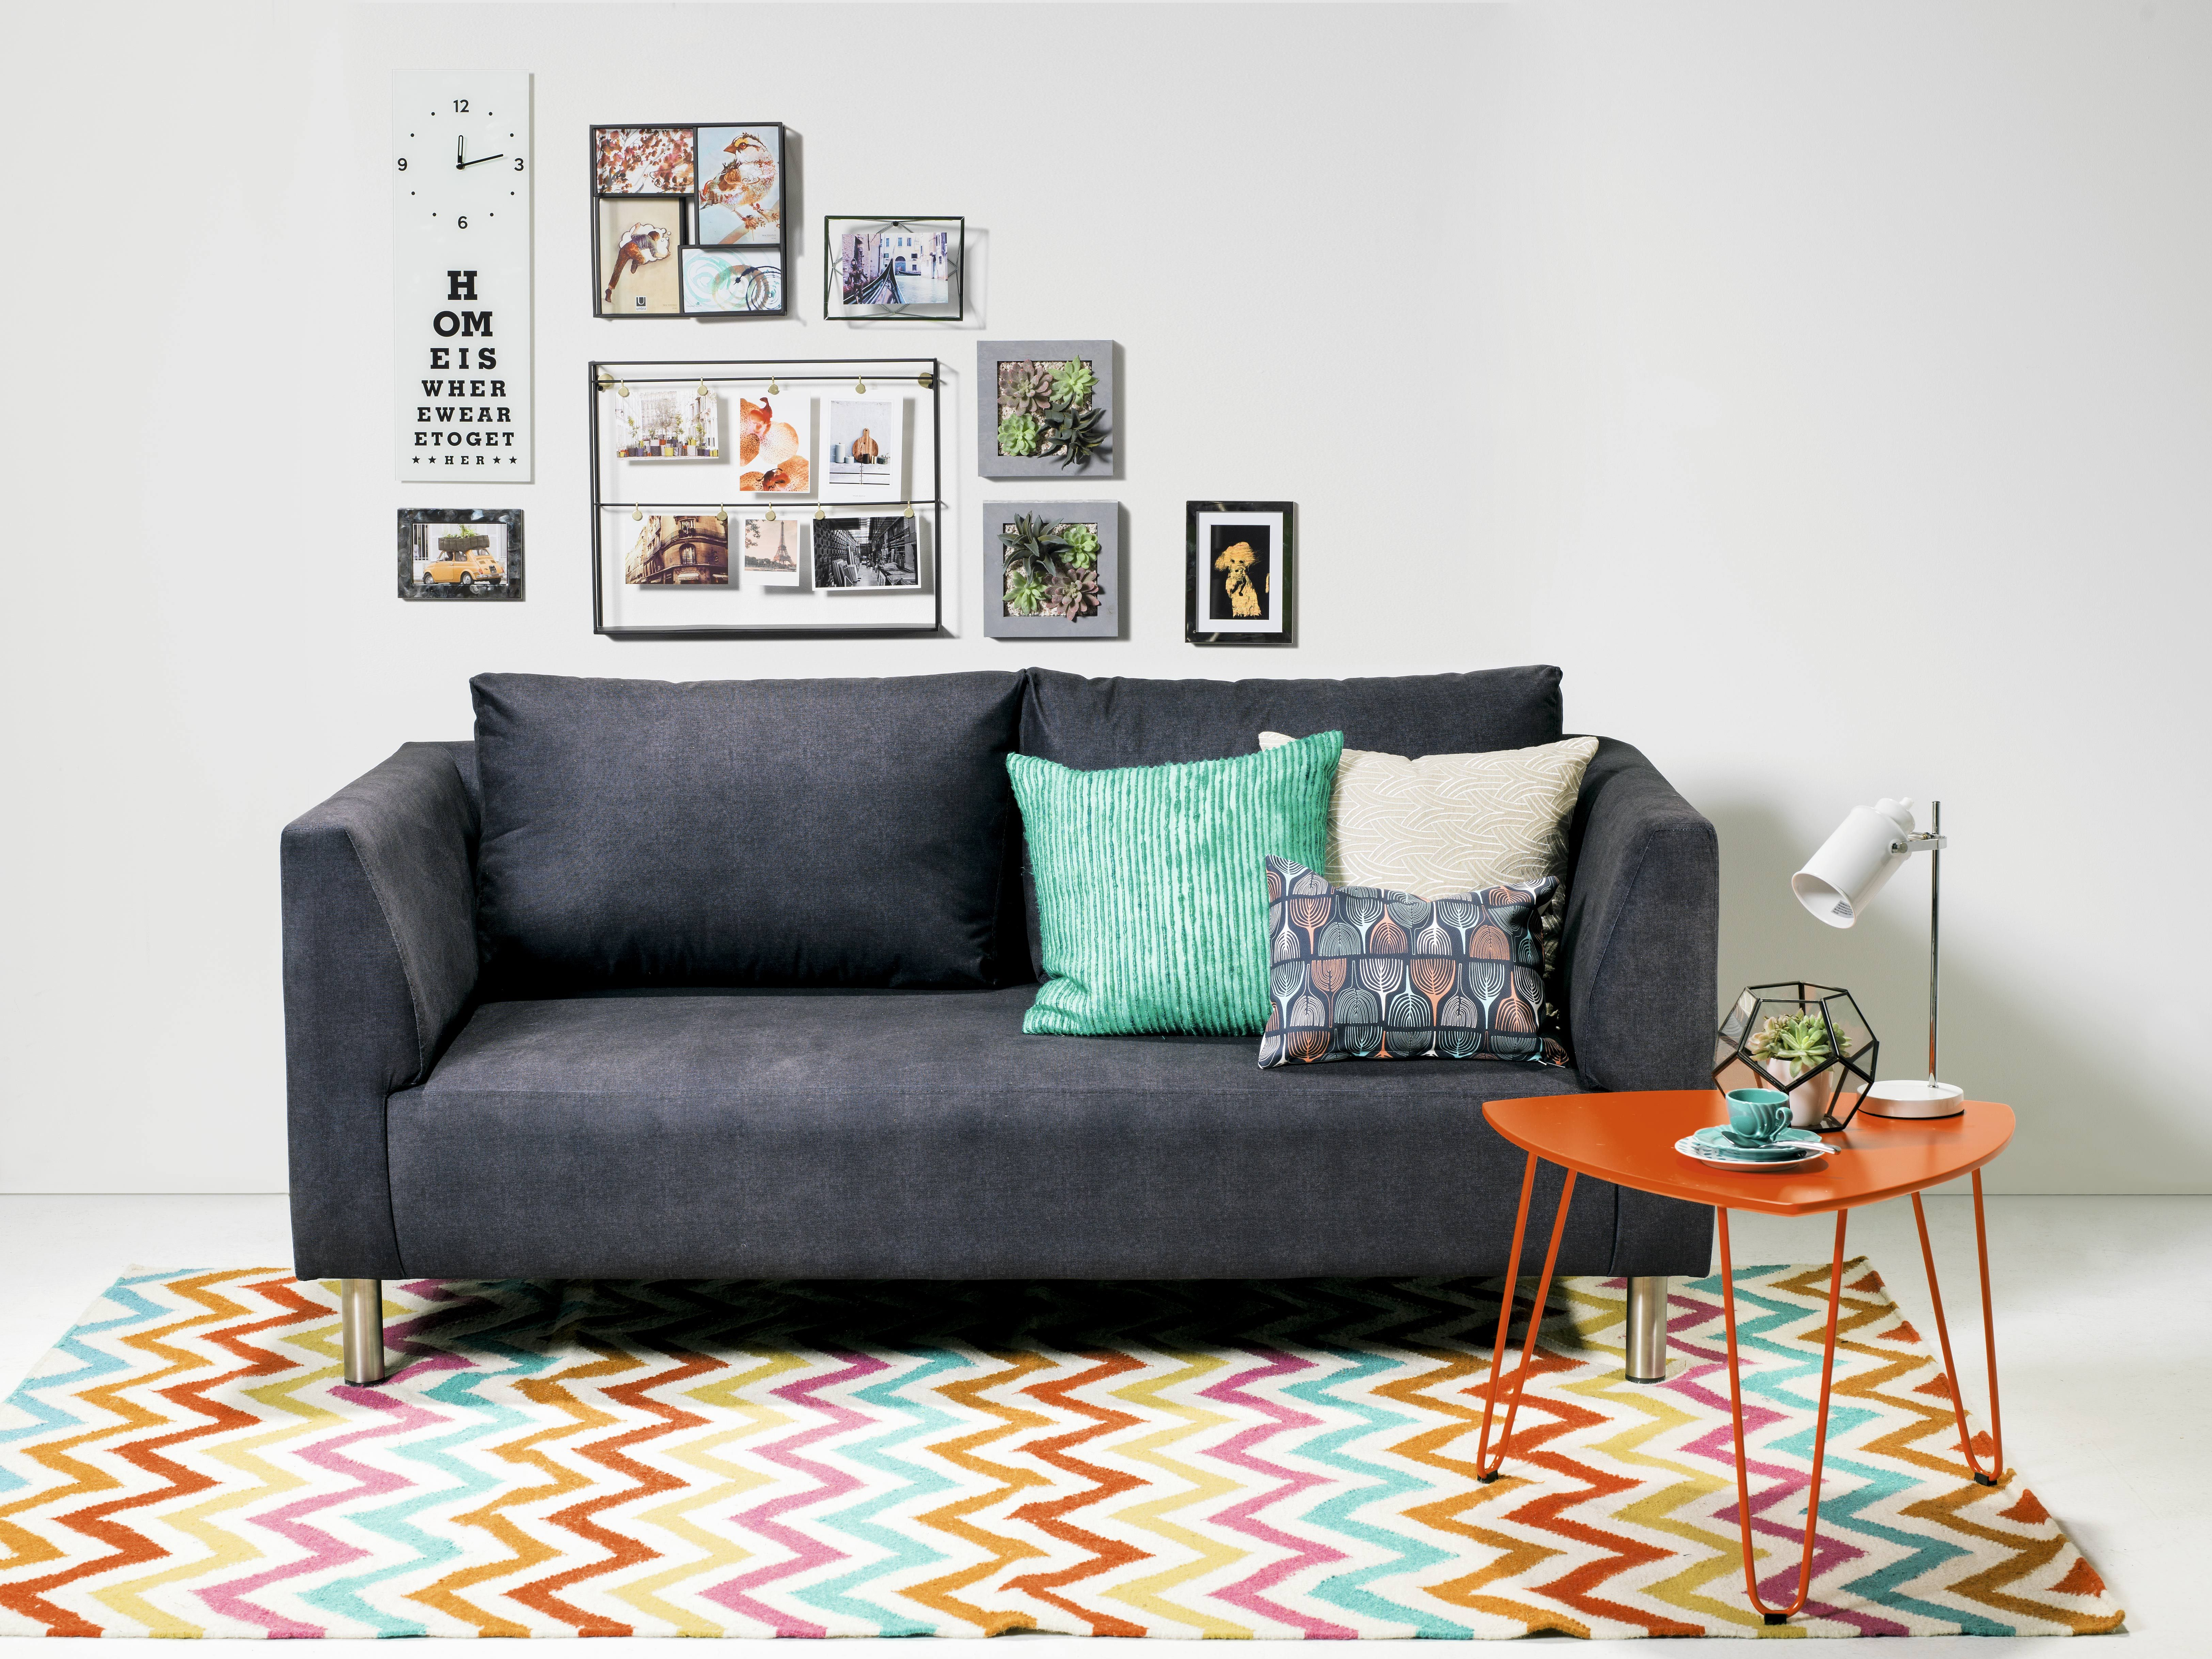 Sof lisboa de 3 puestos presentaci n en color beige gris negro homearticles homedesign - Sofas de ocasion ...